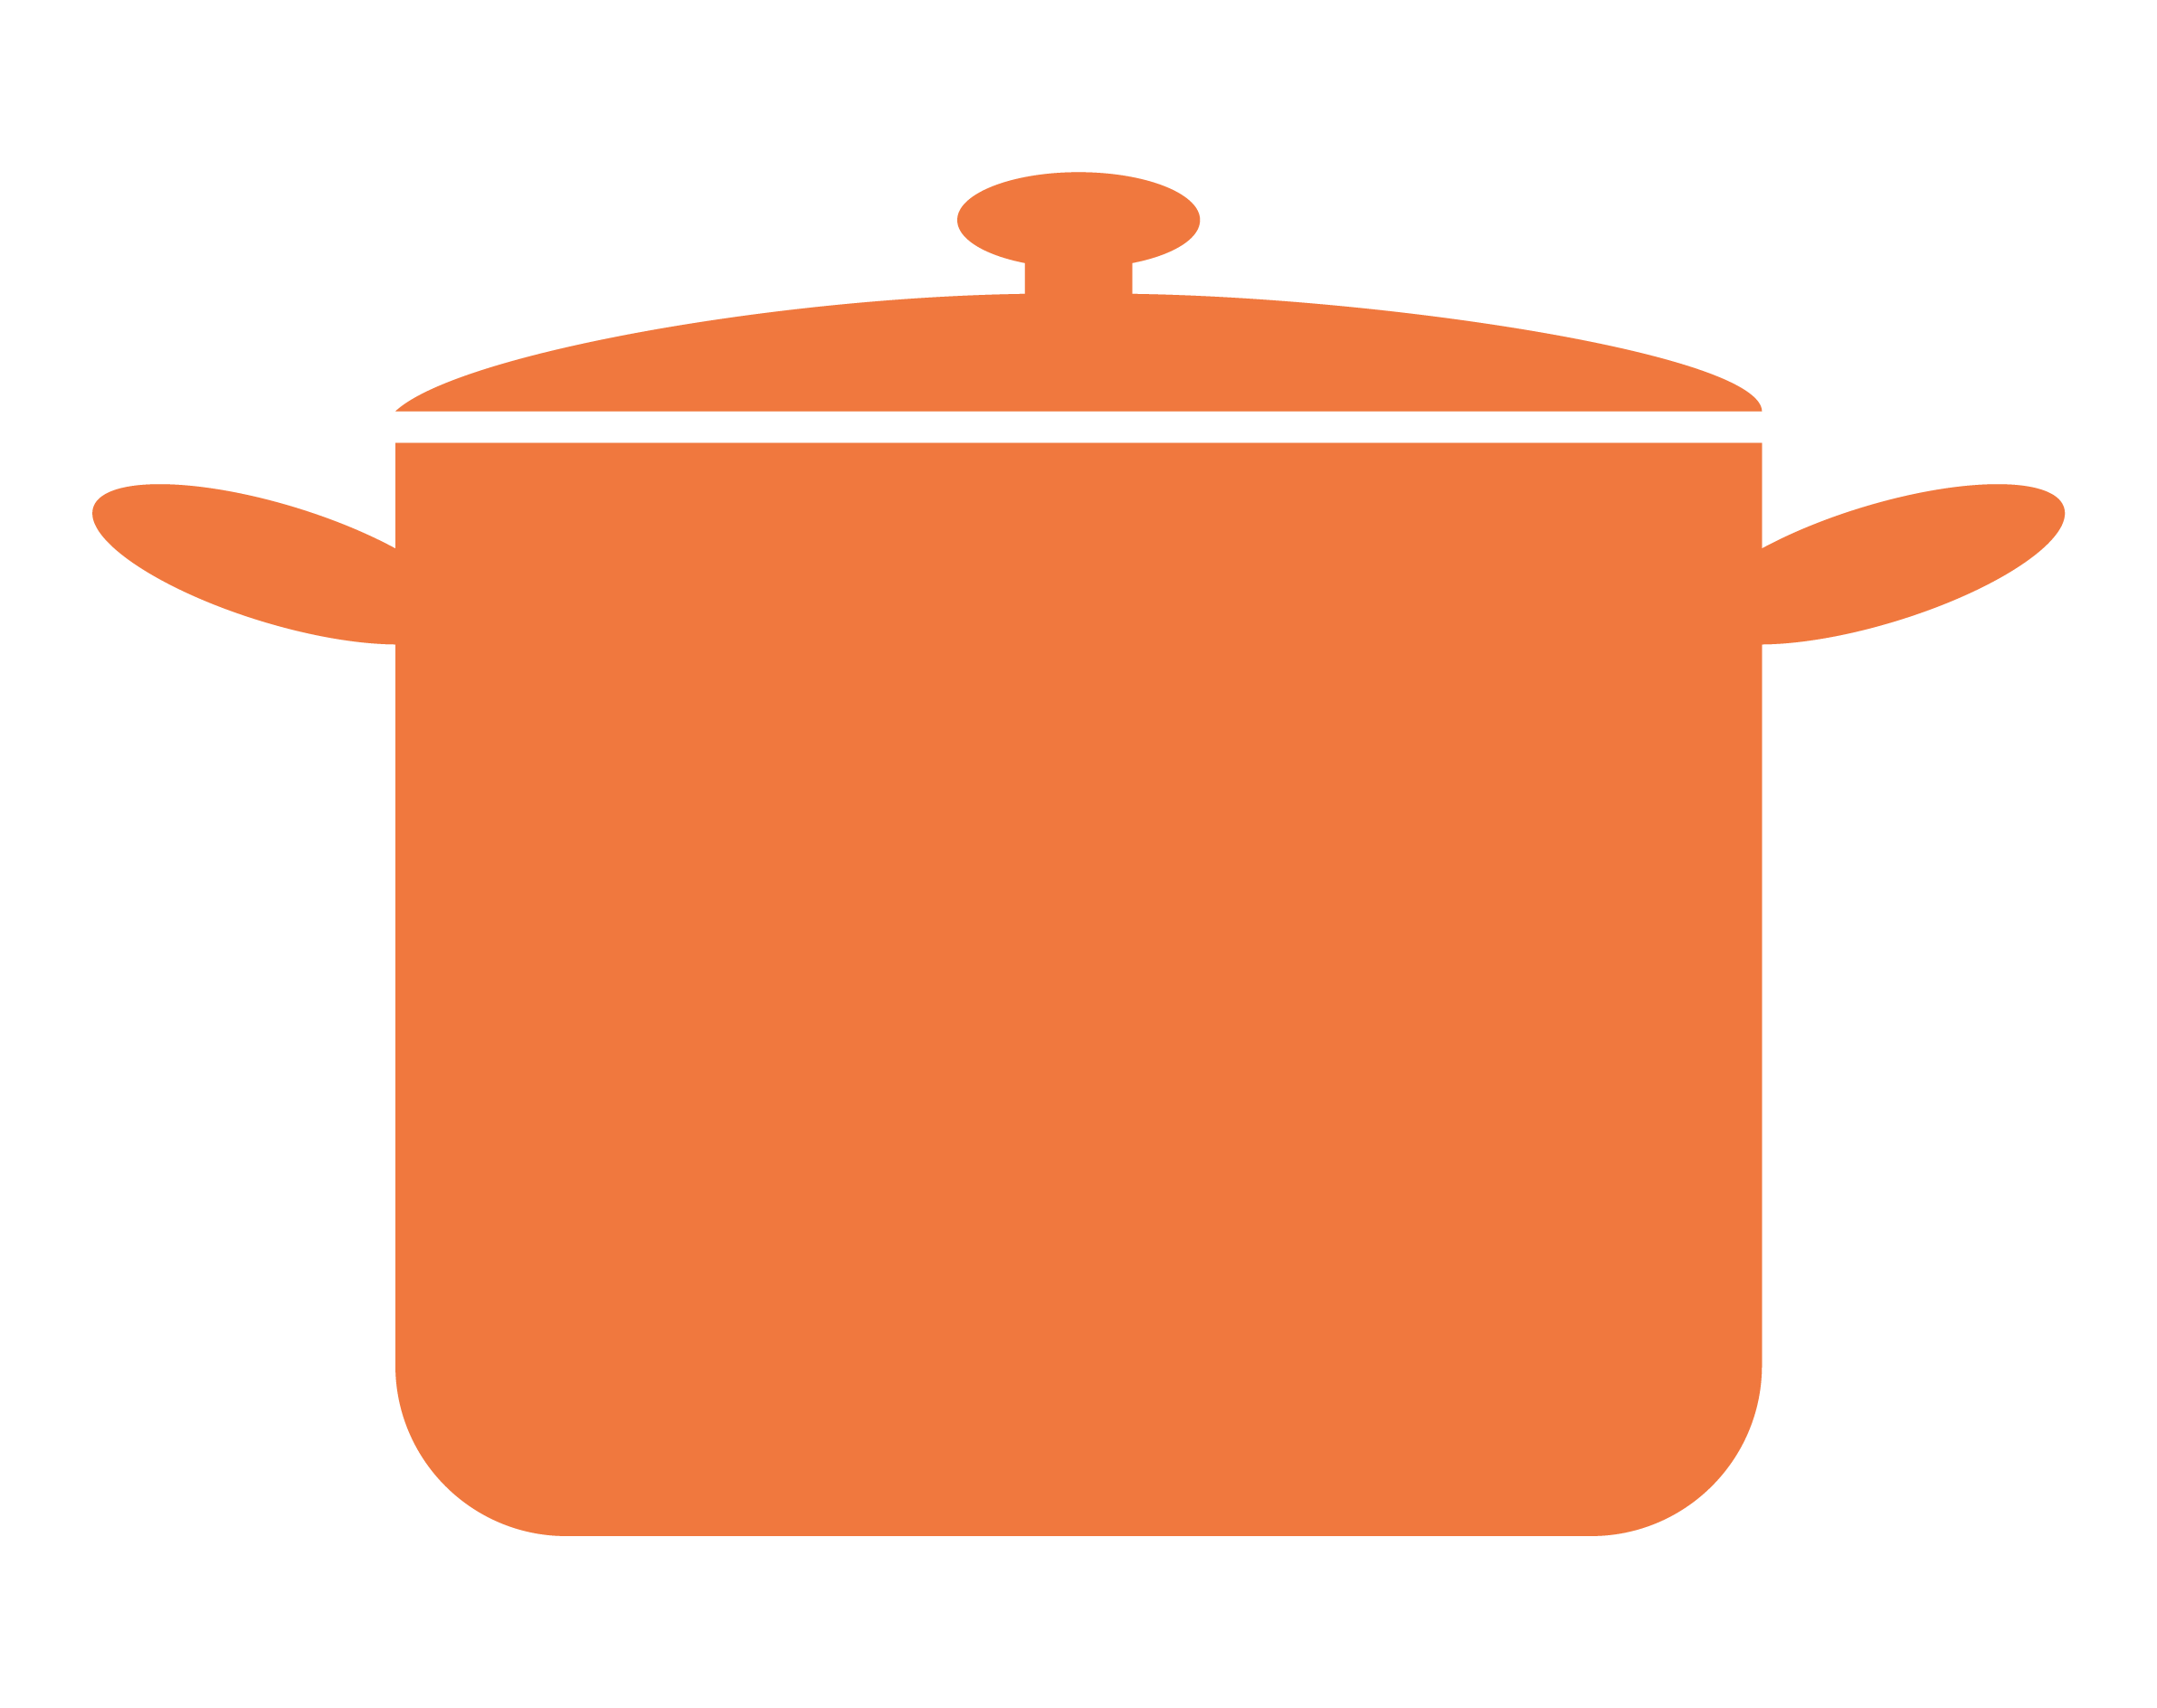 Kitchen utensils clip art pan - Potluck Clipart Clipart Suggest